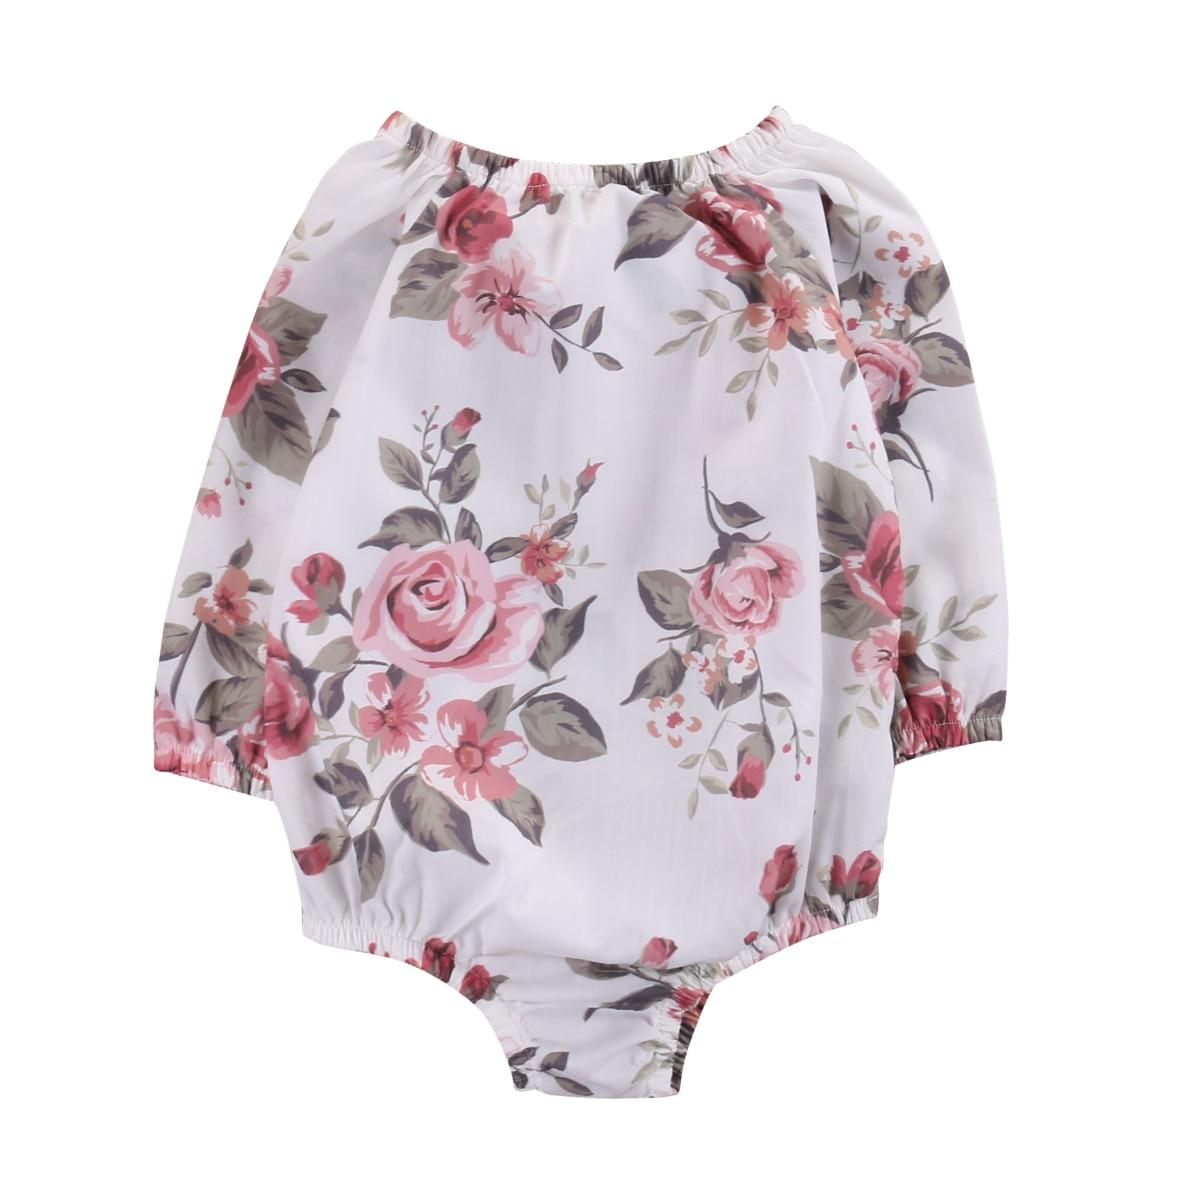 2017 Floral Long Sleeve Infant Baby Girl Romper Jumpsuit Cotton Outfit Sunsuit